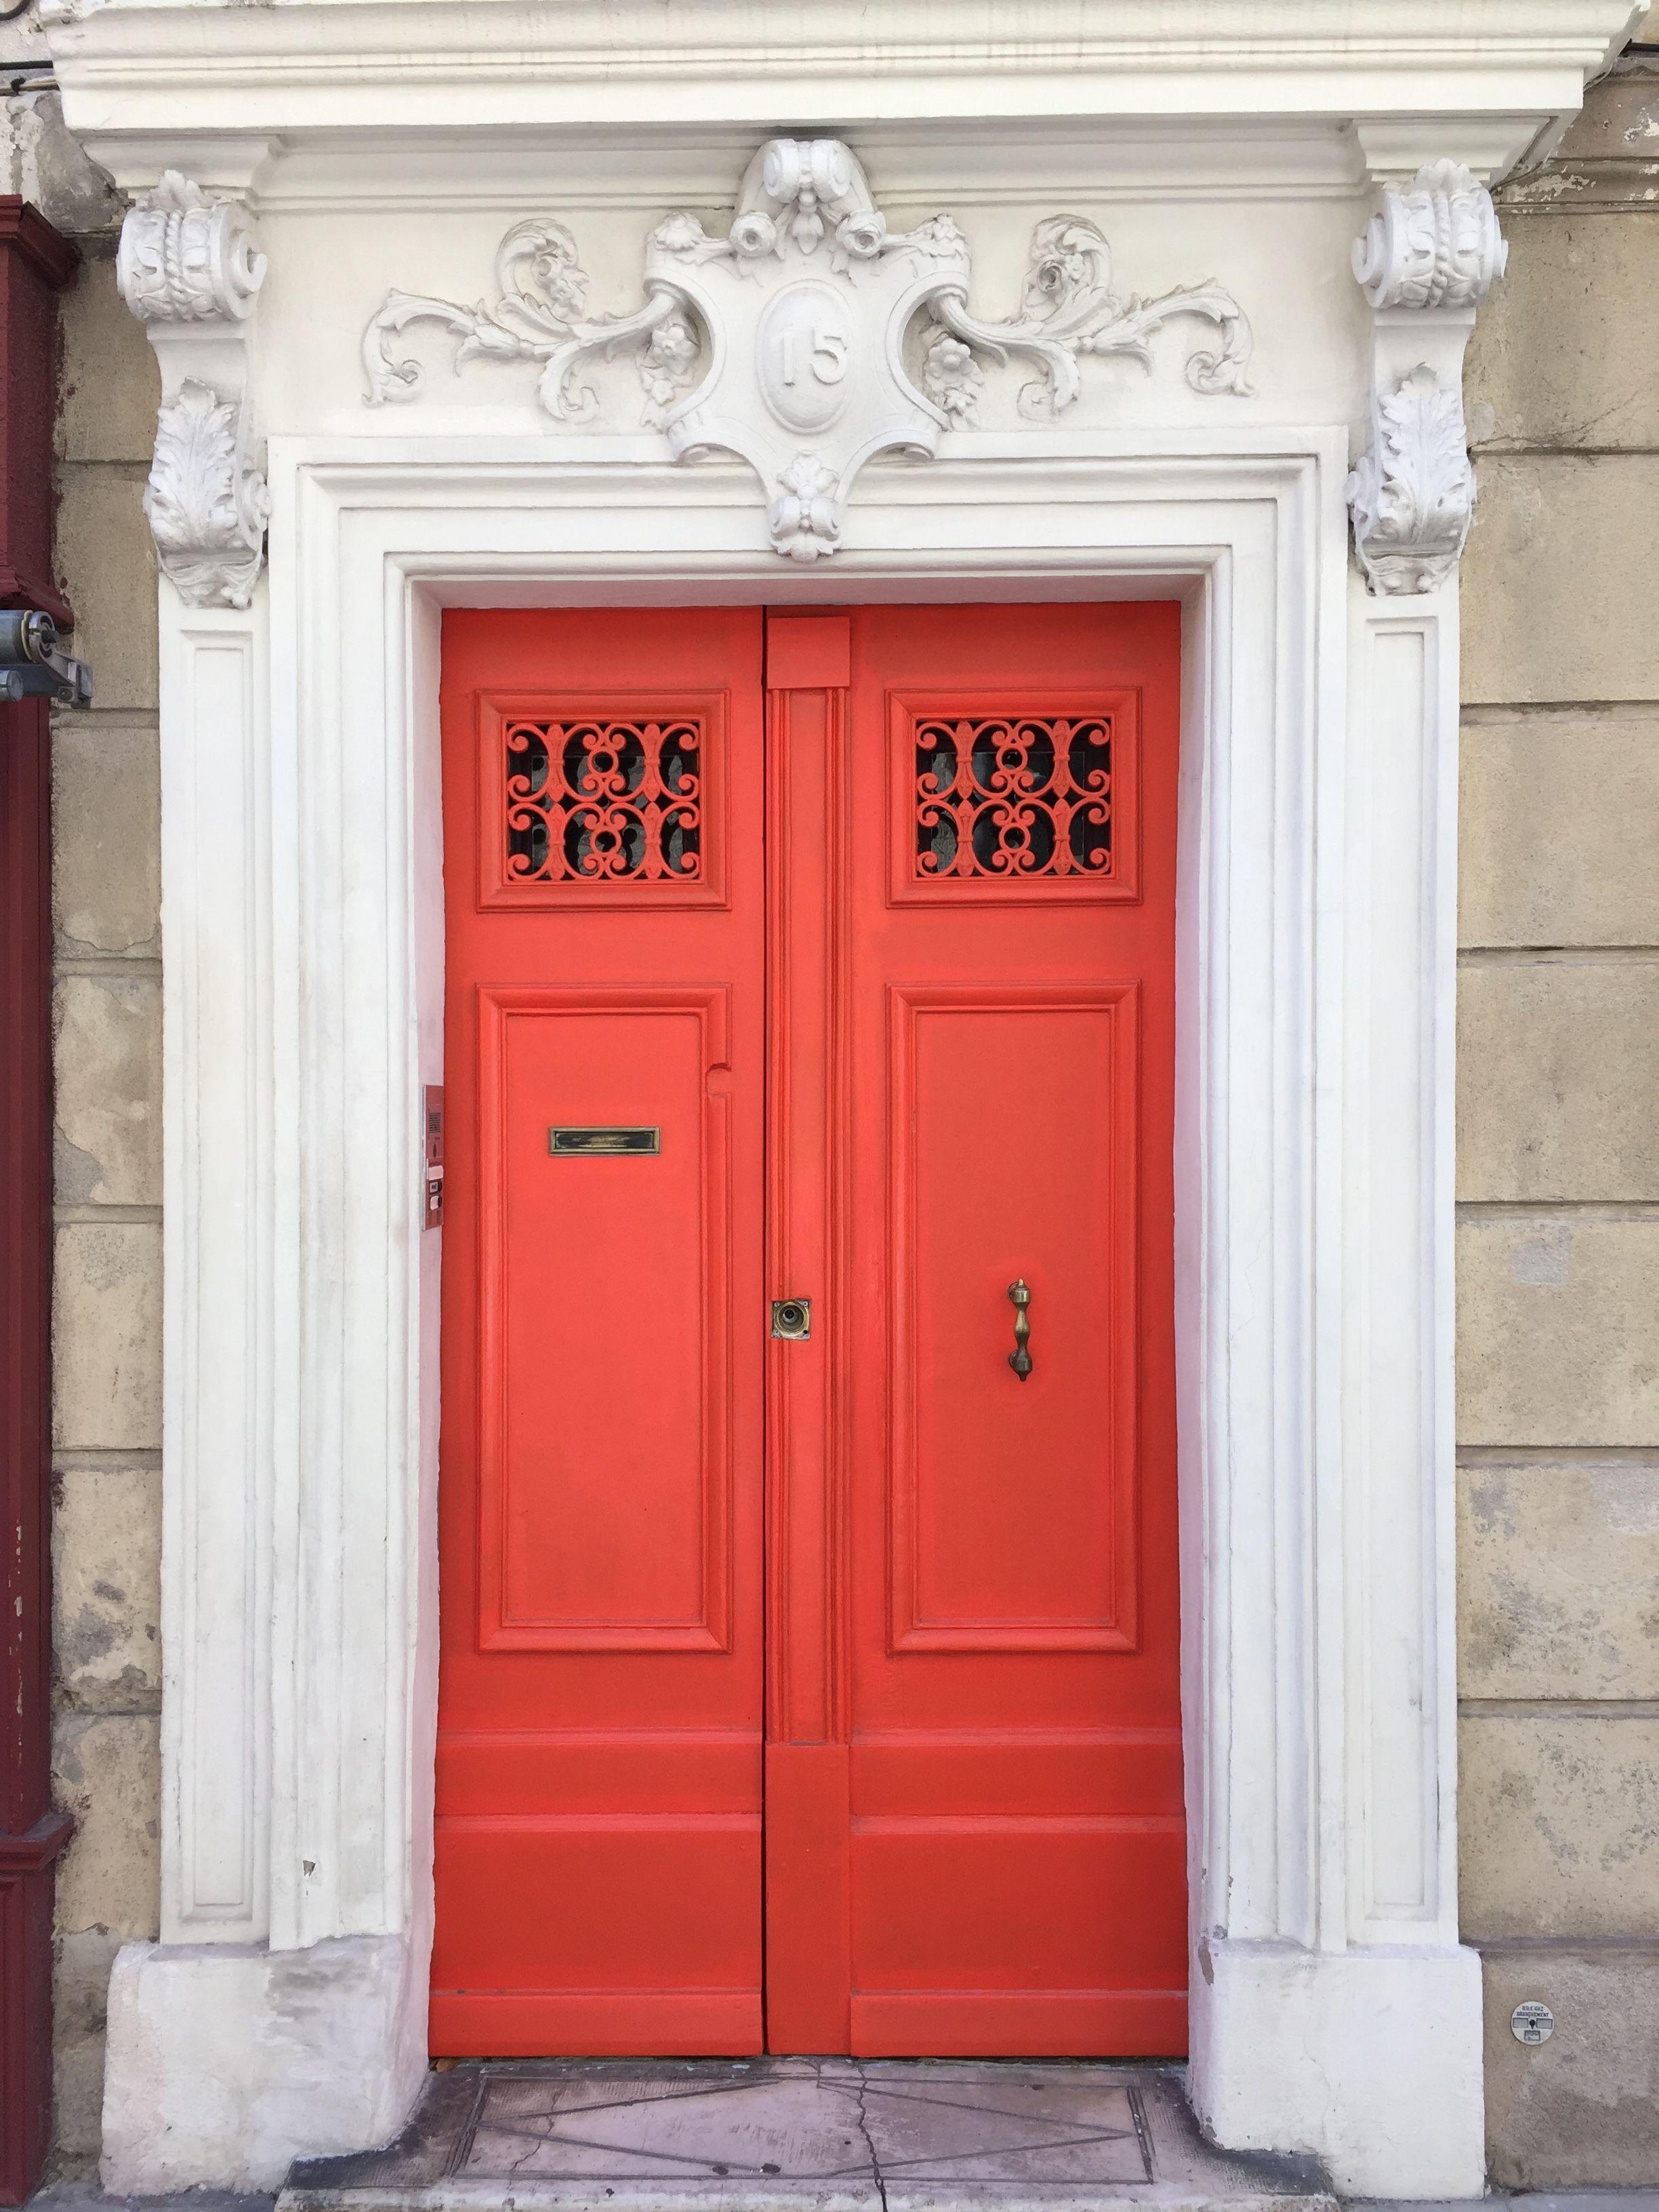 Foyer Door Opener : Pin by anirudh deo on doors pinterest medieval